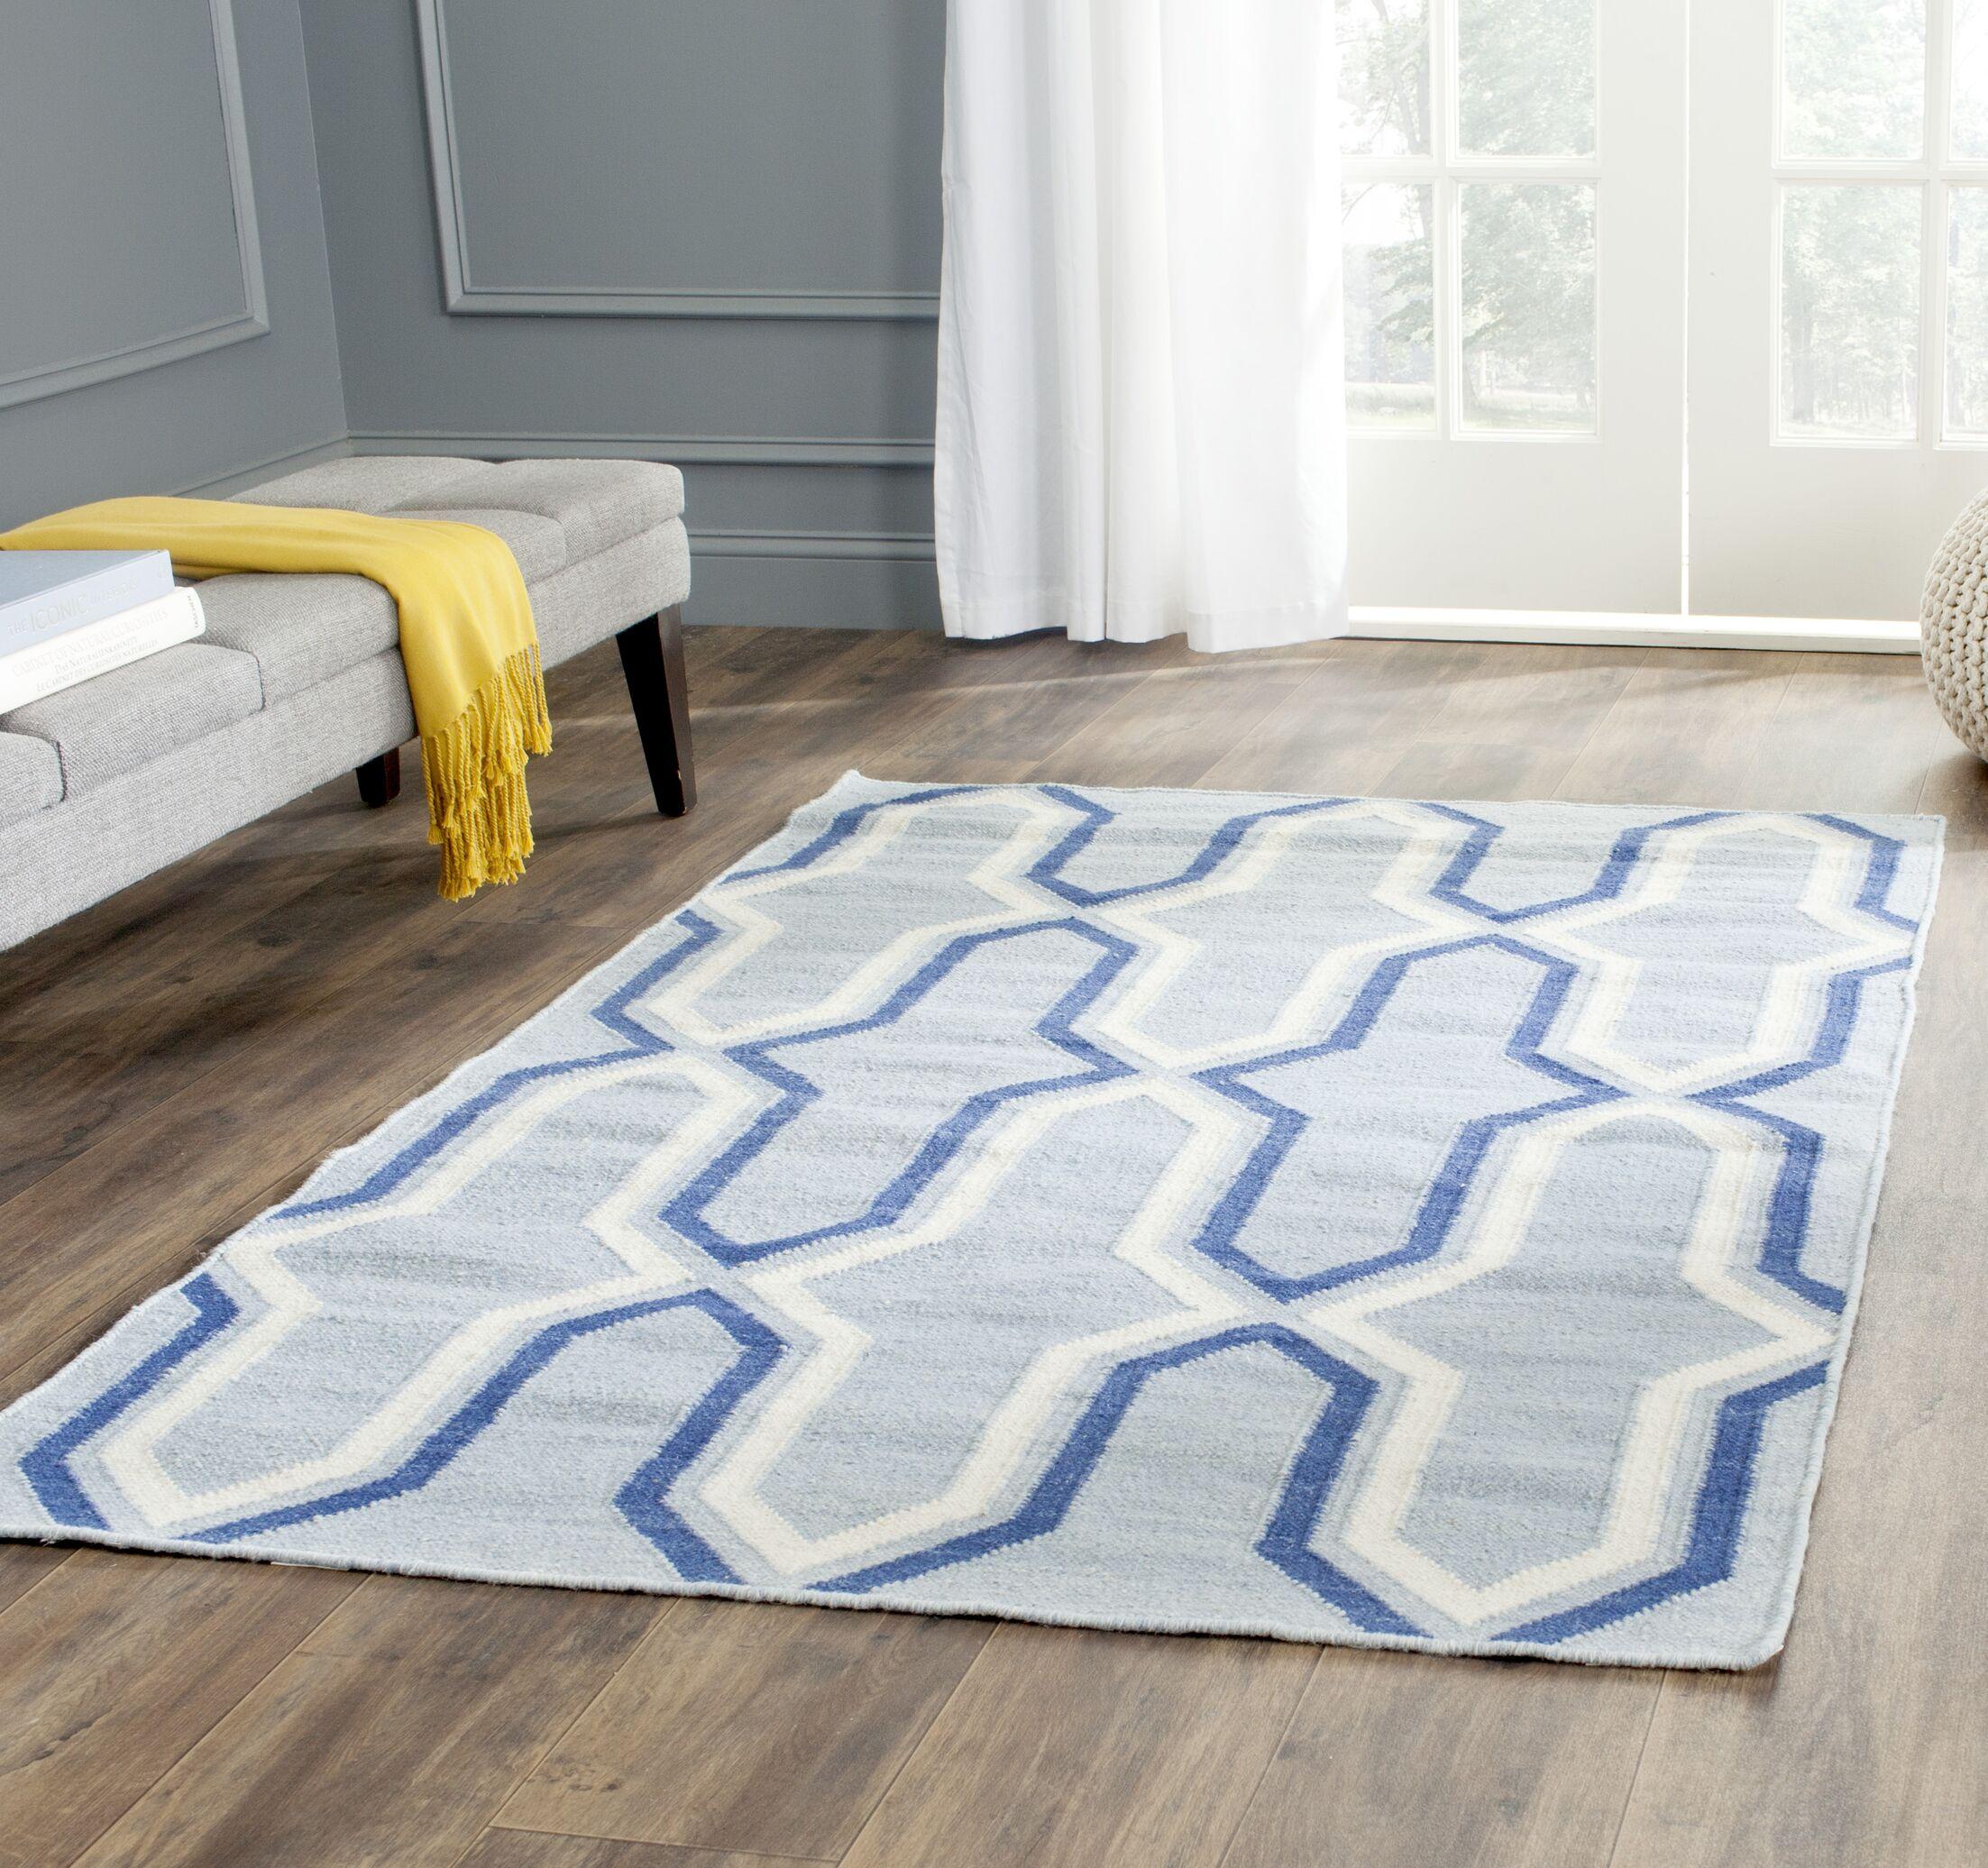 Dhurries Handmade Light Blue/Dark Blue Area Rug Rug Size: Rectangle 6' x 9'